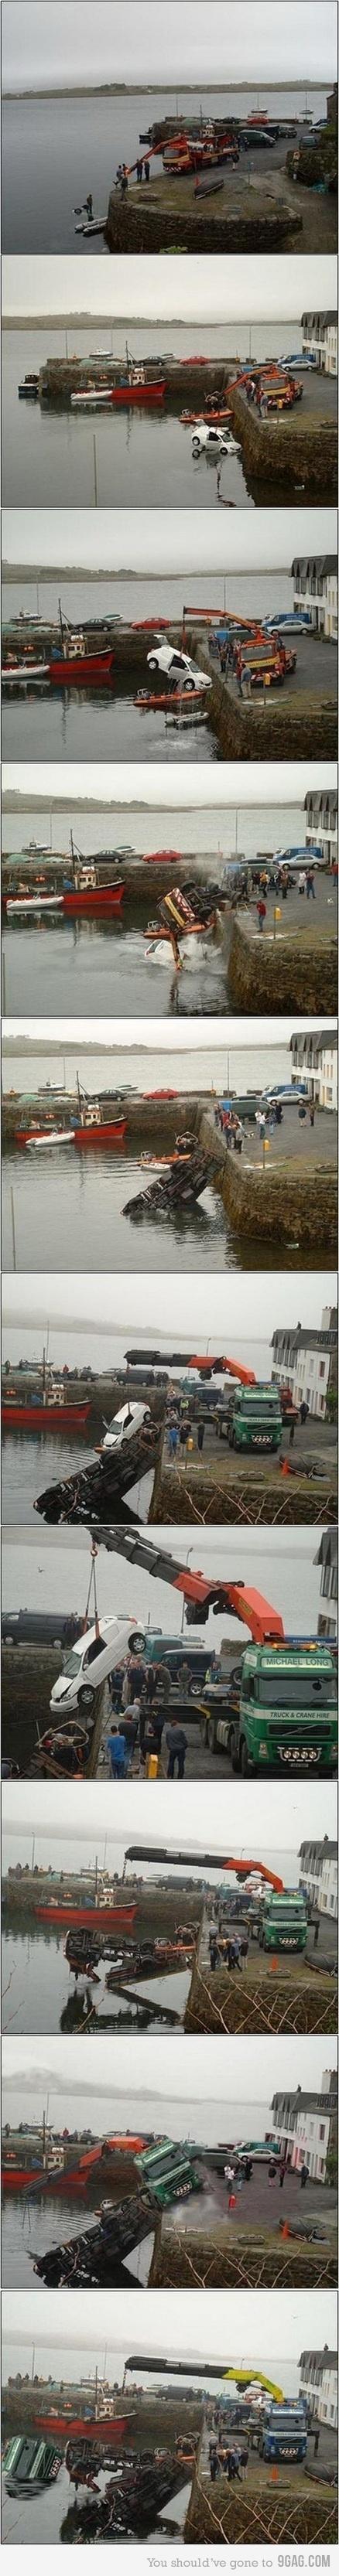 triple fail: Tow Trucks, Laughing, Funny Pics, Epic Fails, Funny Stuff, Humor, Bad Day, So Funny, One Job